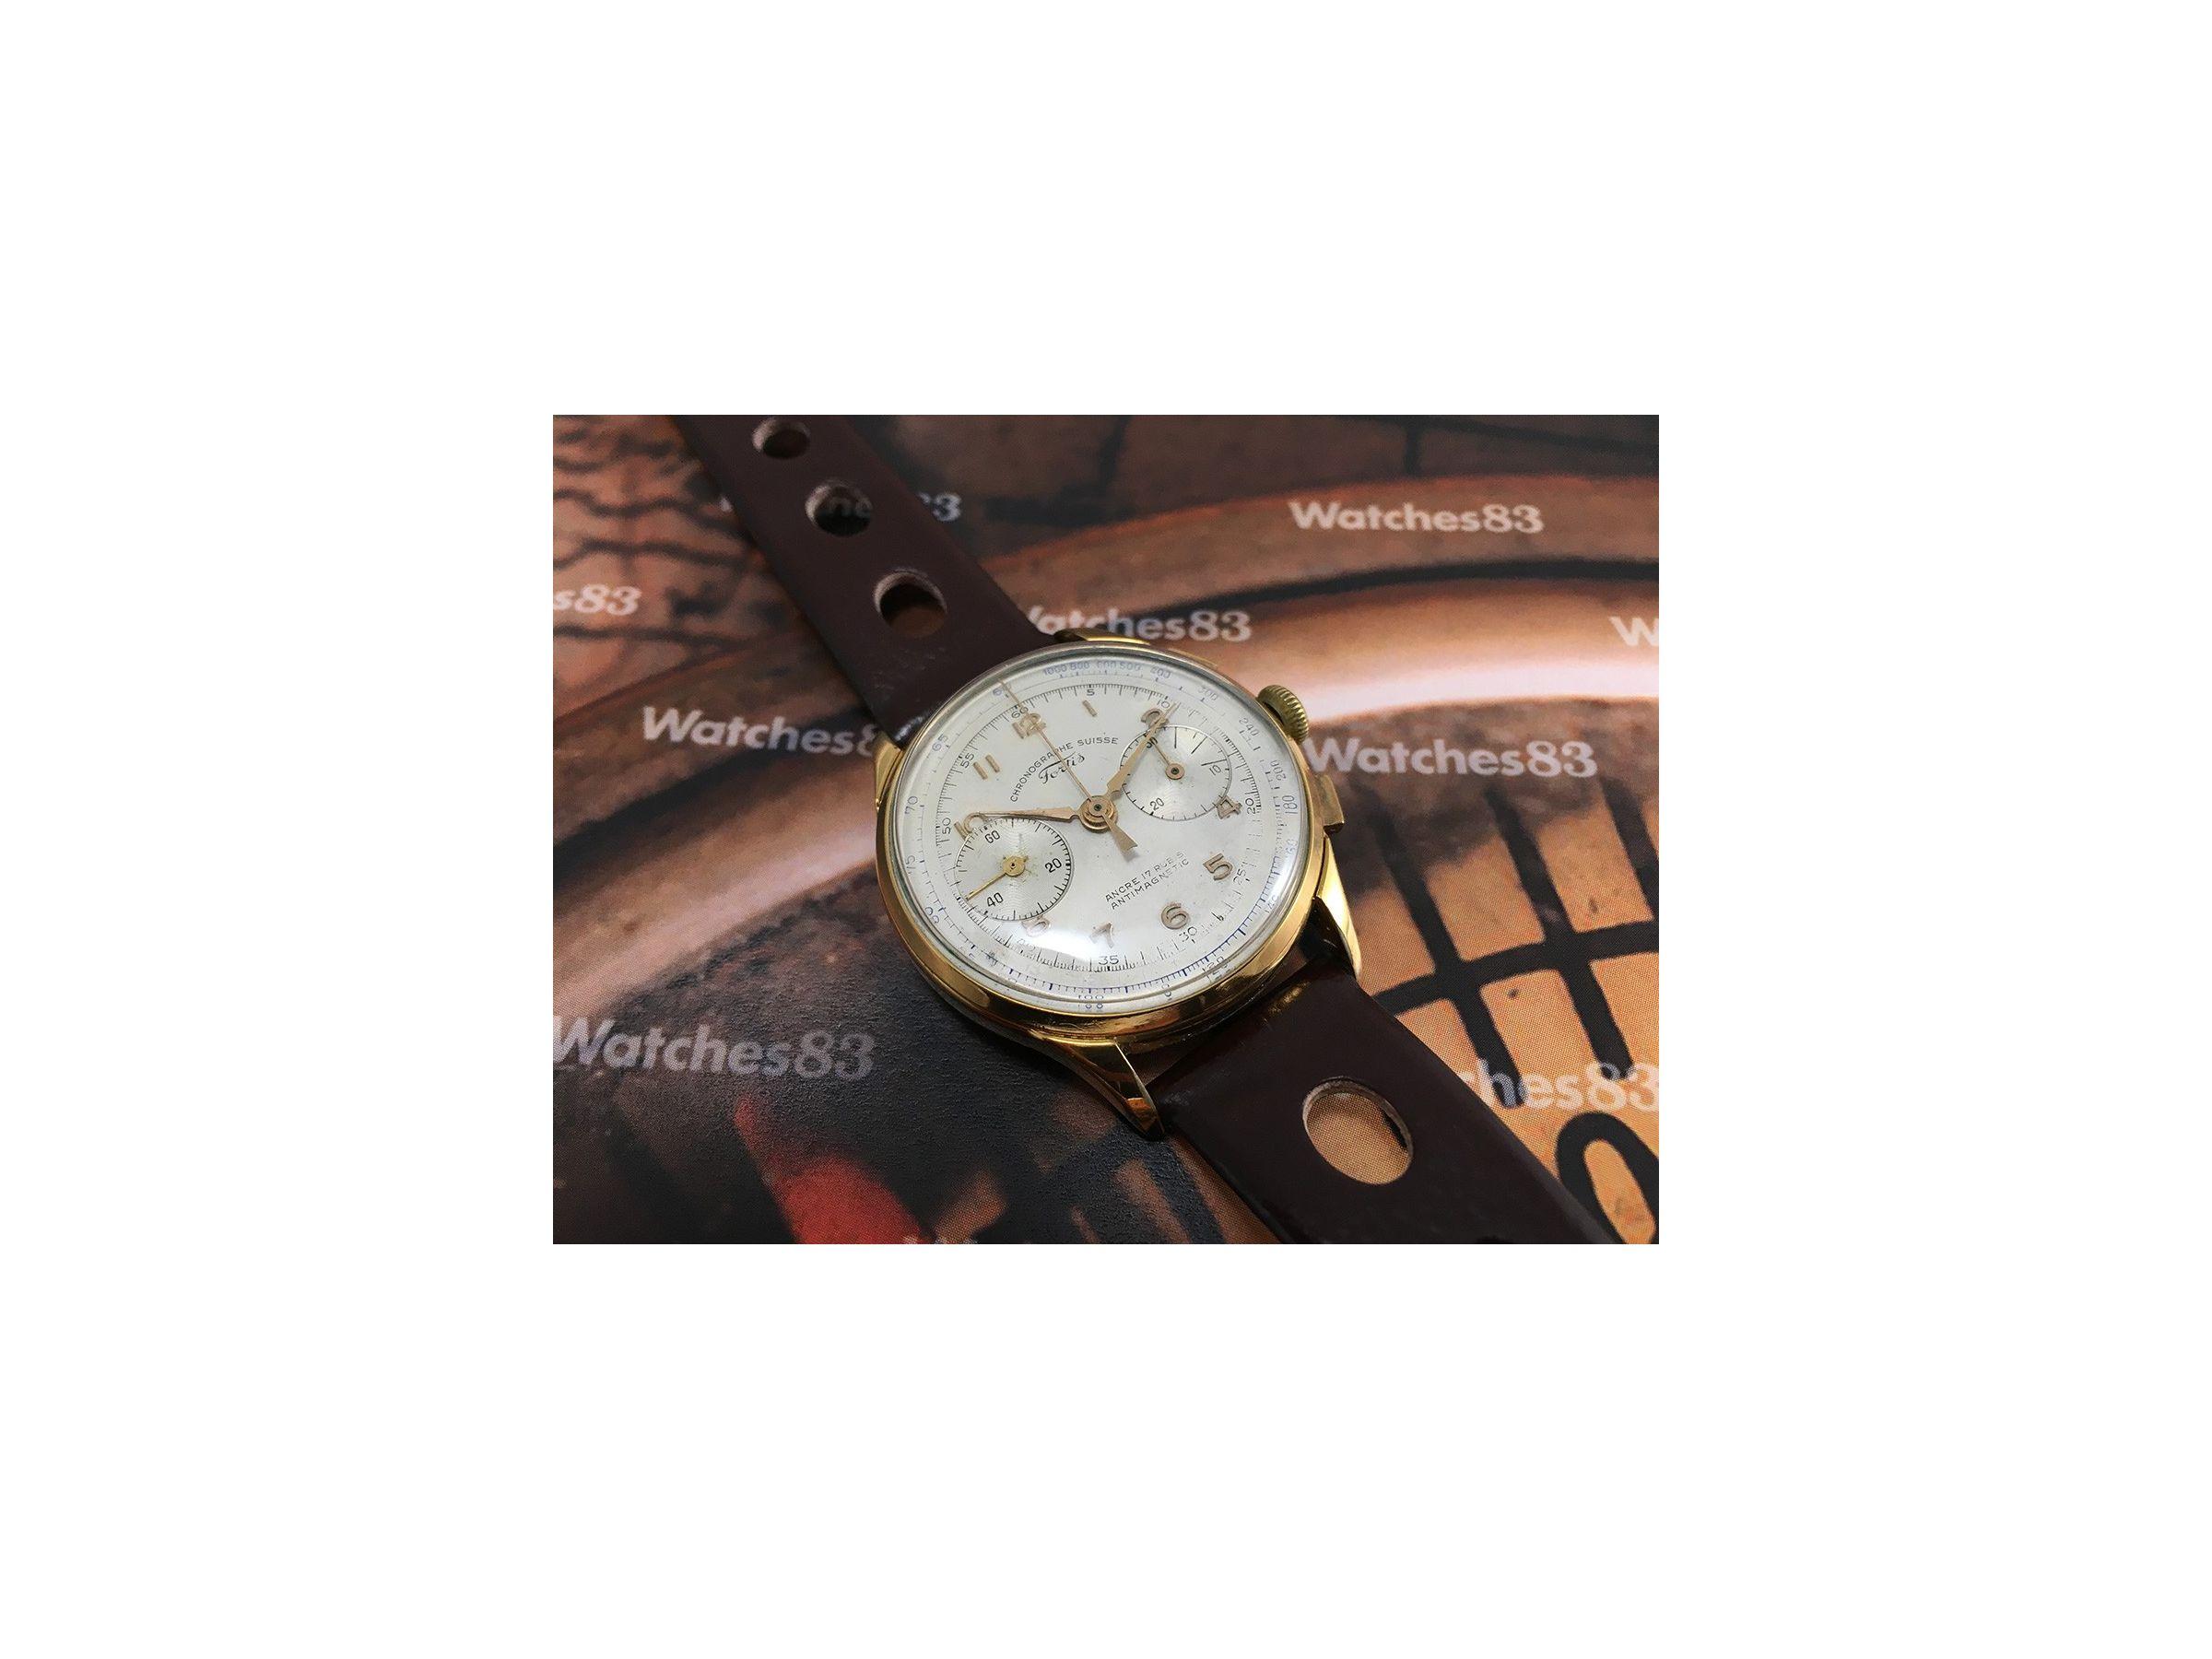 a1e489d414db ... Fortis vintage reloj de cuerda cronógrafo Chronographe Suisse      ESPECTACULAR    ...